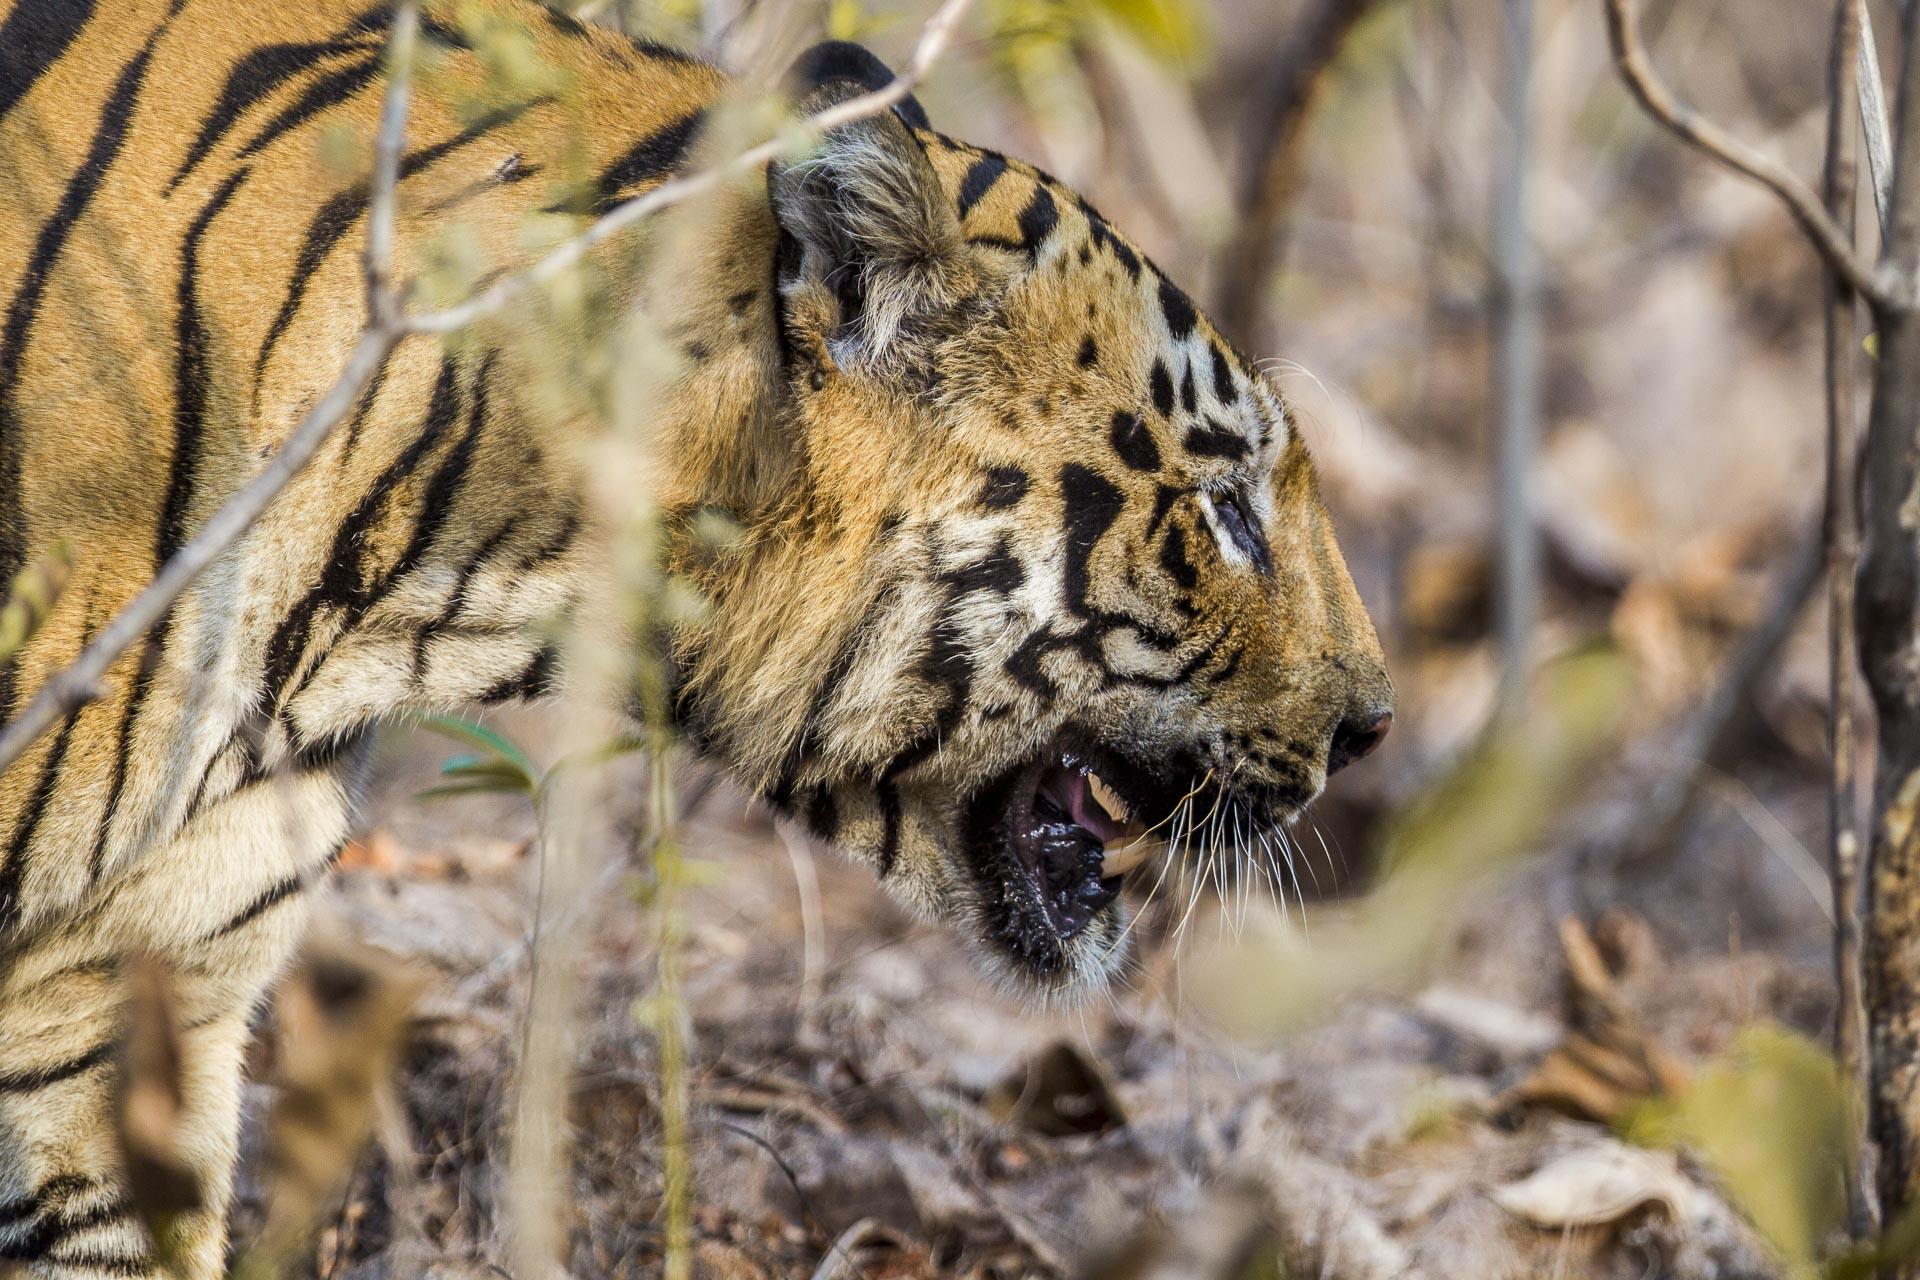 Tigre du bengale - Inde